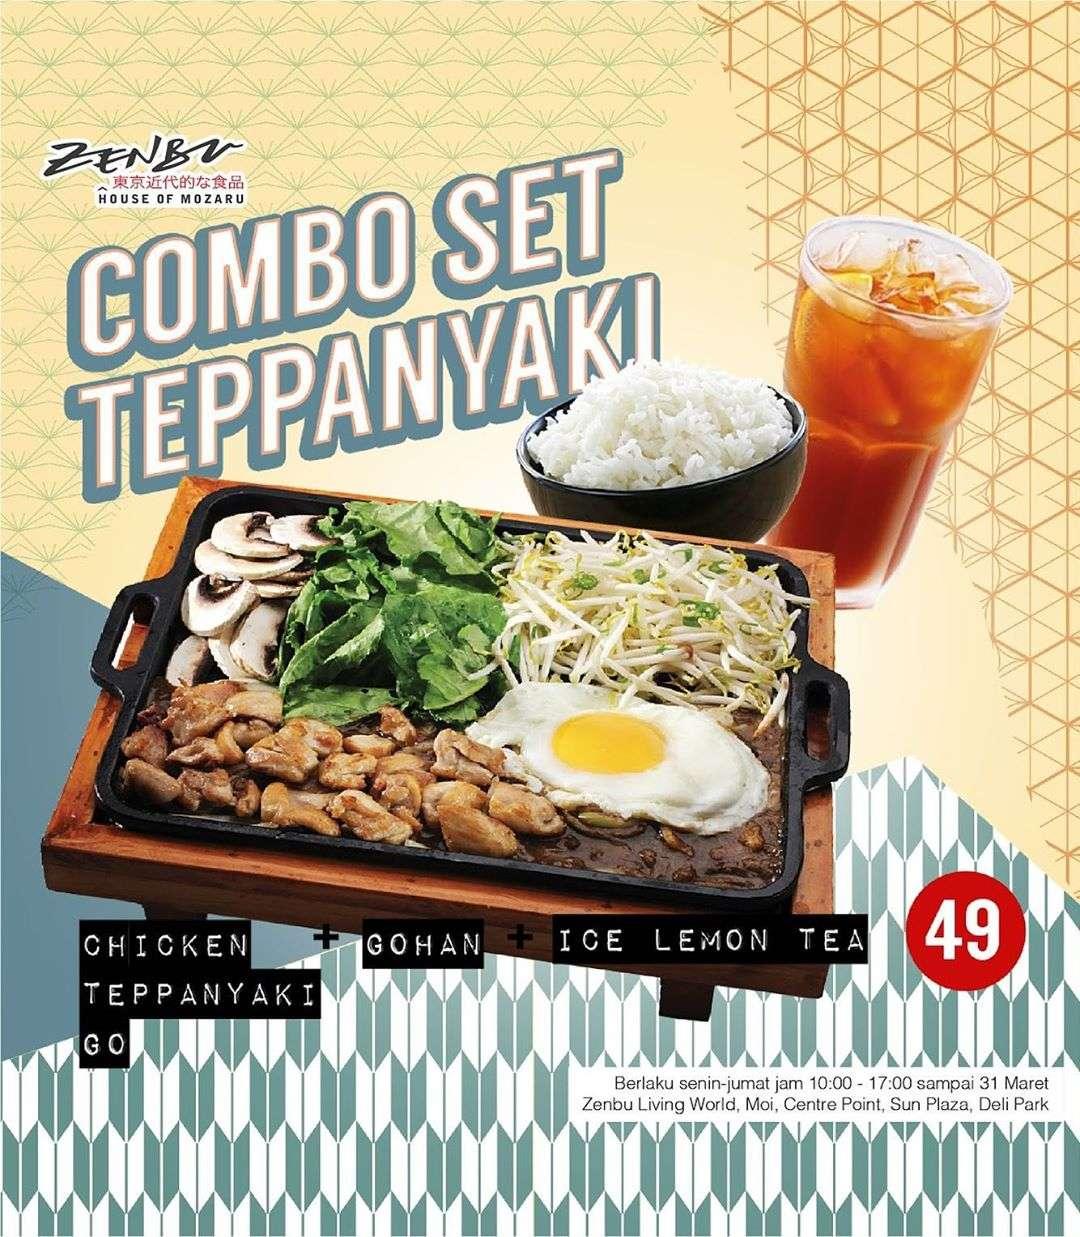 Diskon Zenbu Promo Combo Set Teppanyaki For Only IDR 49.000